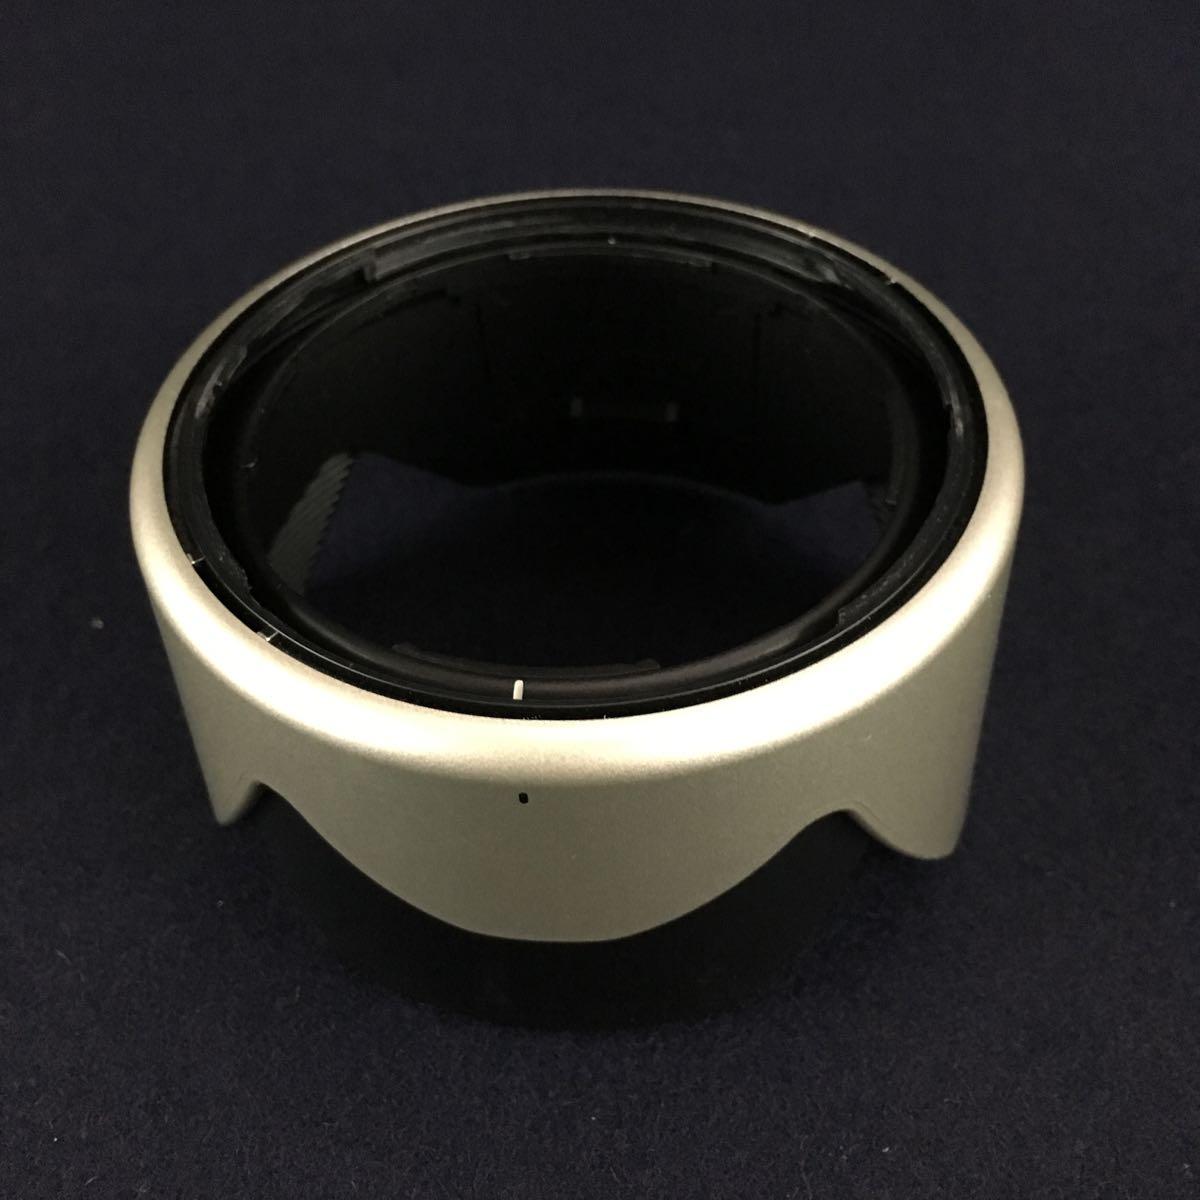 PENTAX-FA 43mm 1.9 Limited / FA 28-200mm 3.8-5.6 オートフォーカスレンズ2点_画像9